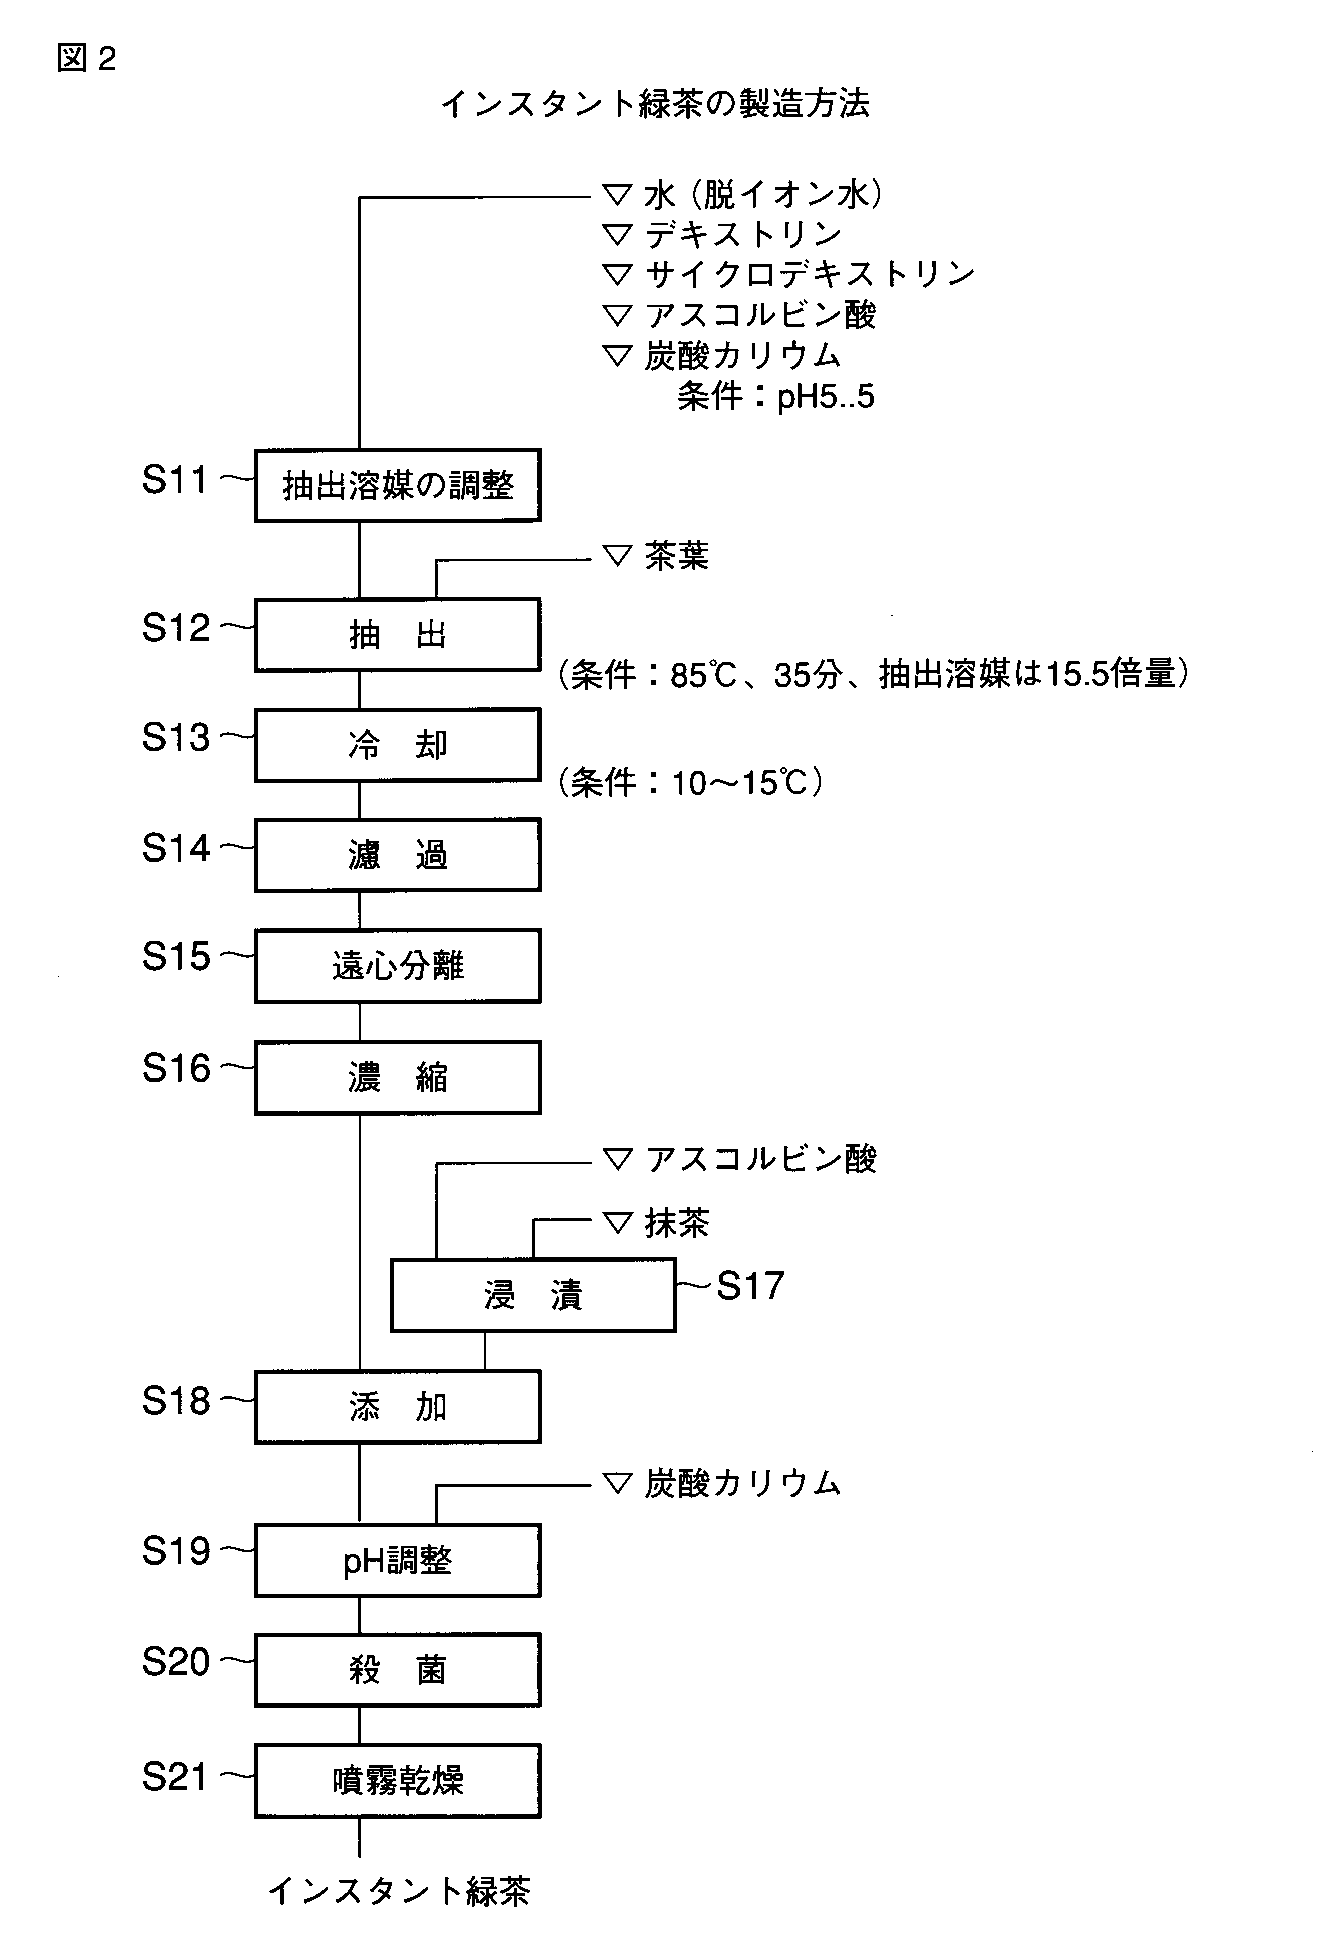 tea2025b应用电路图